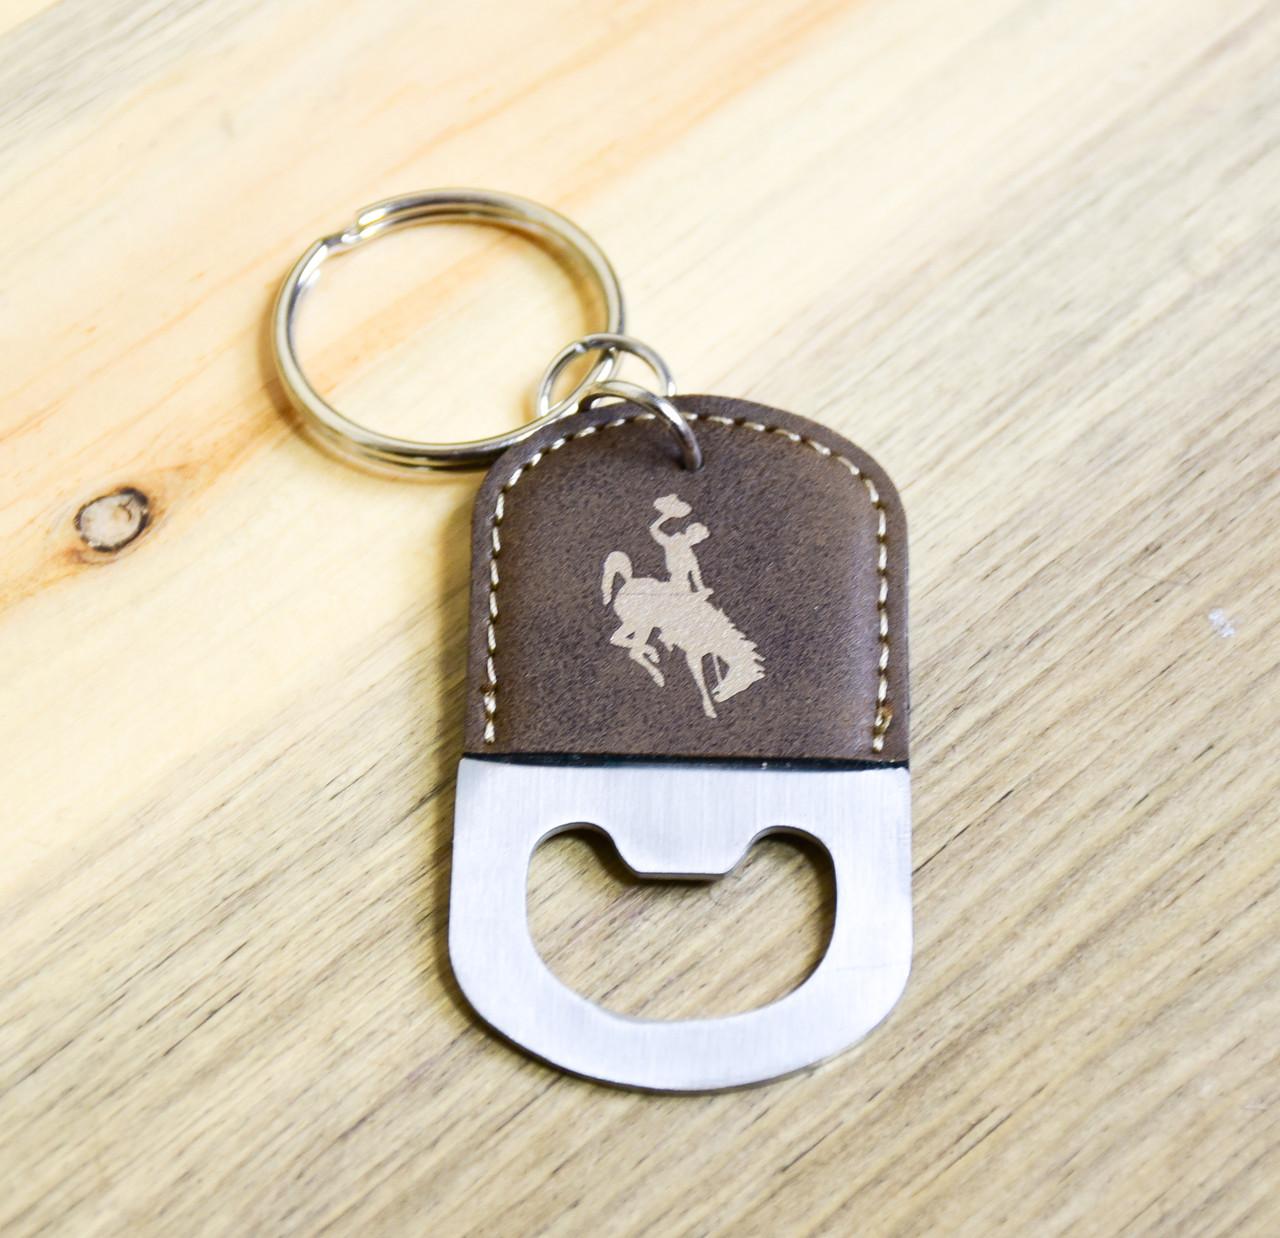 Wyoming Steamboat Key Chain Bottle Opener